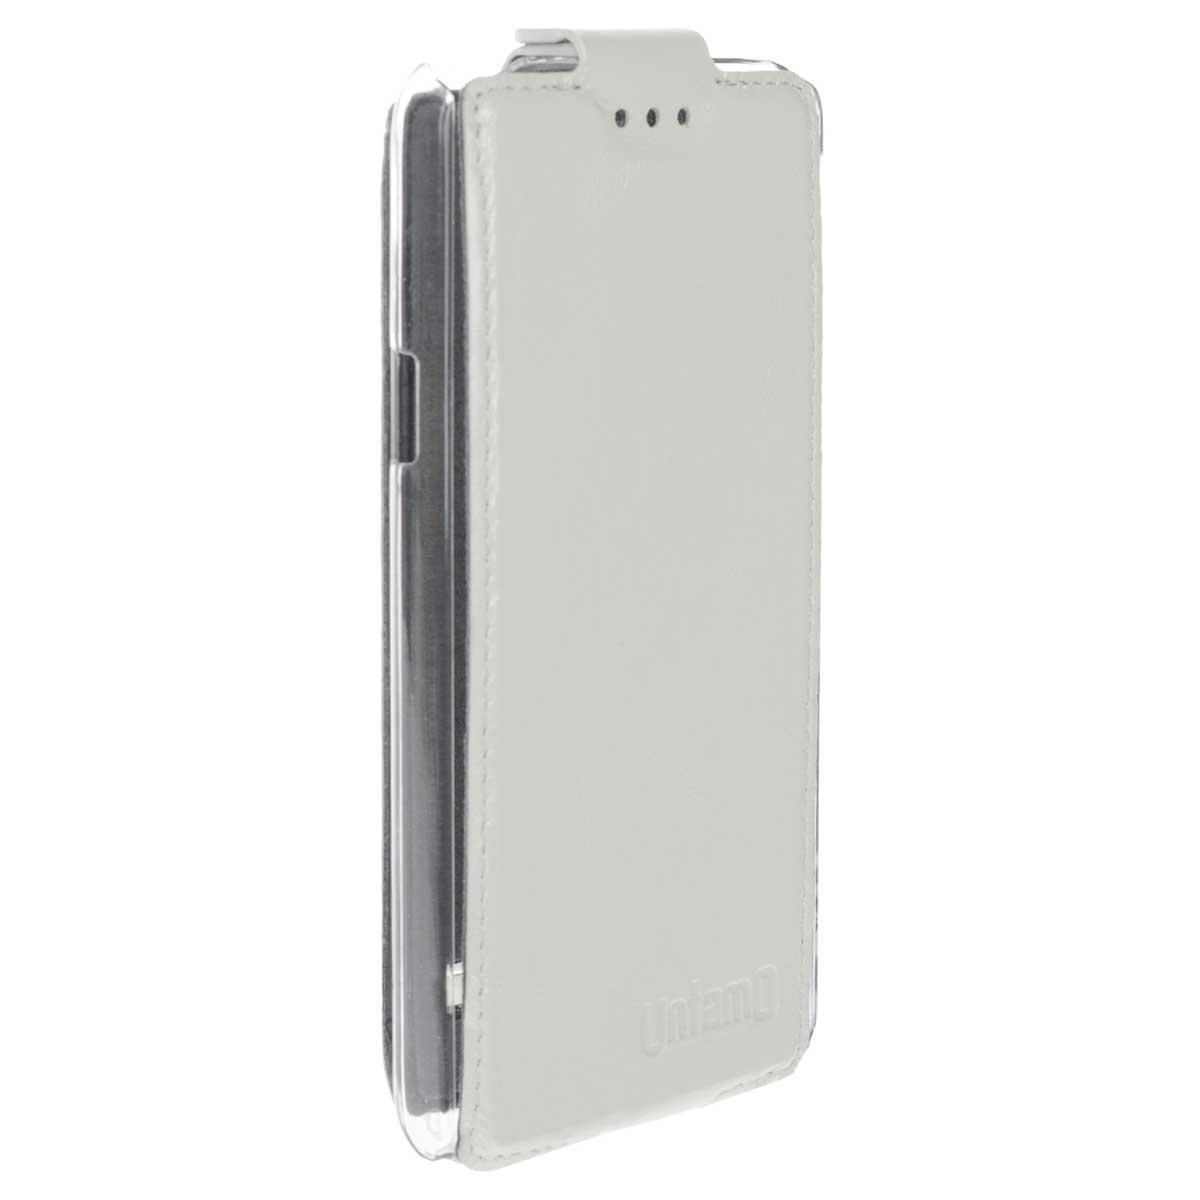 Untamo Timber чехол-флип для Huawei Honor II, Ermin White (UTIMFHH2EWH)